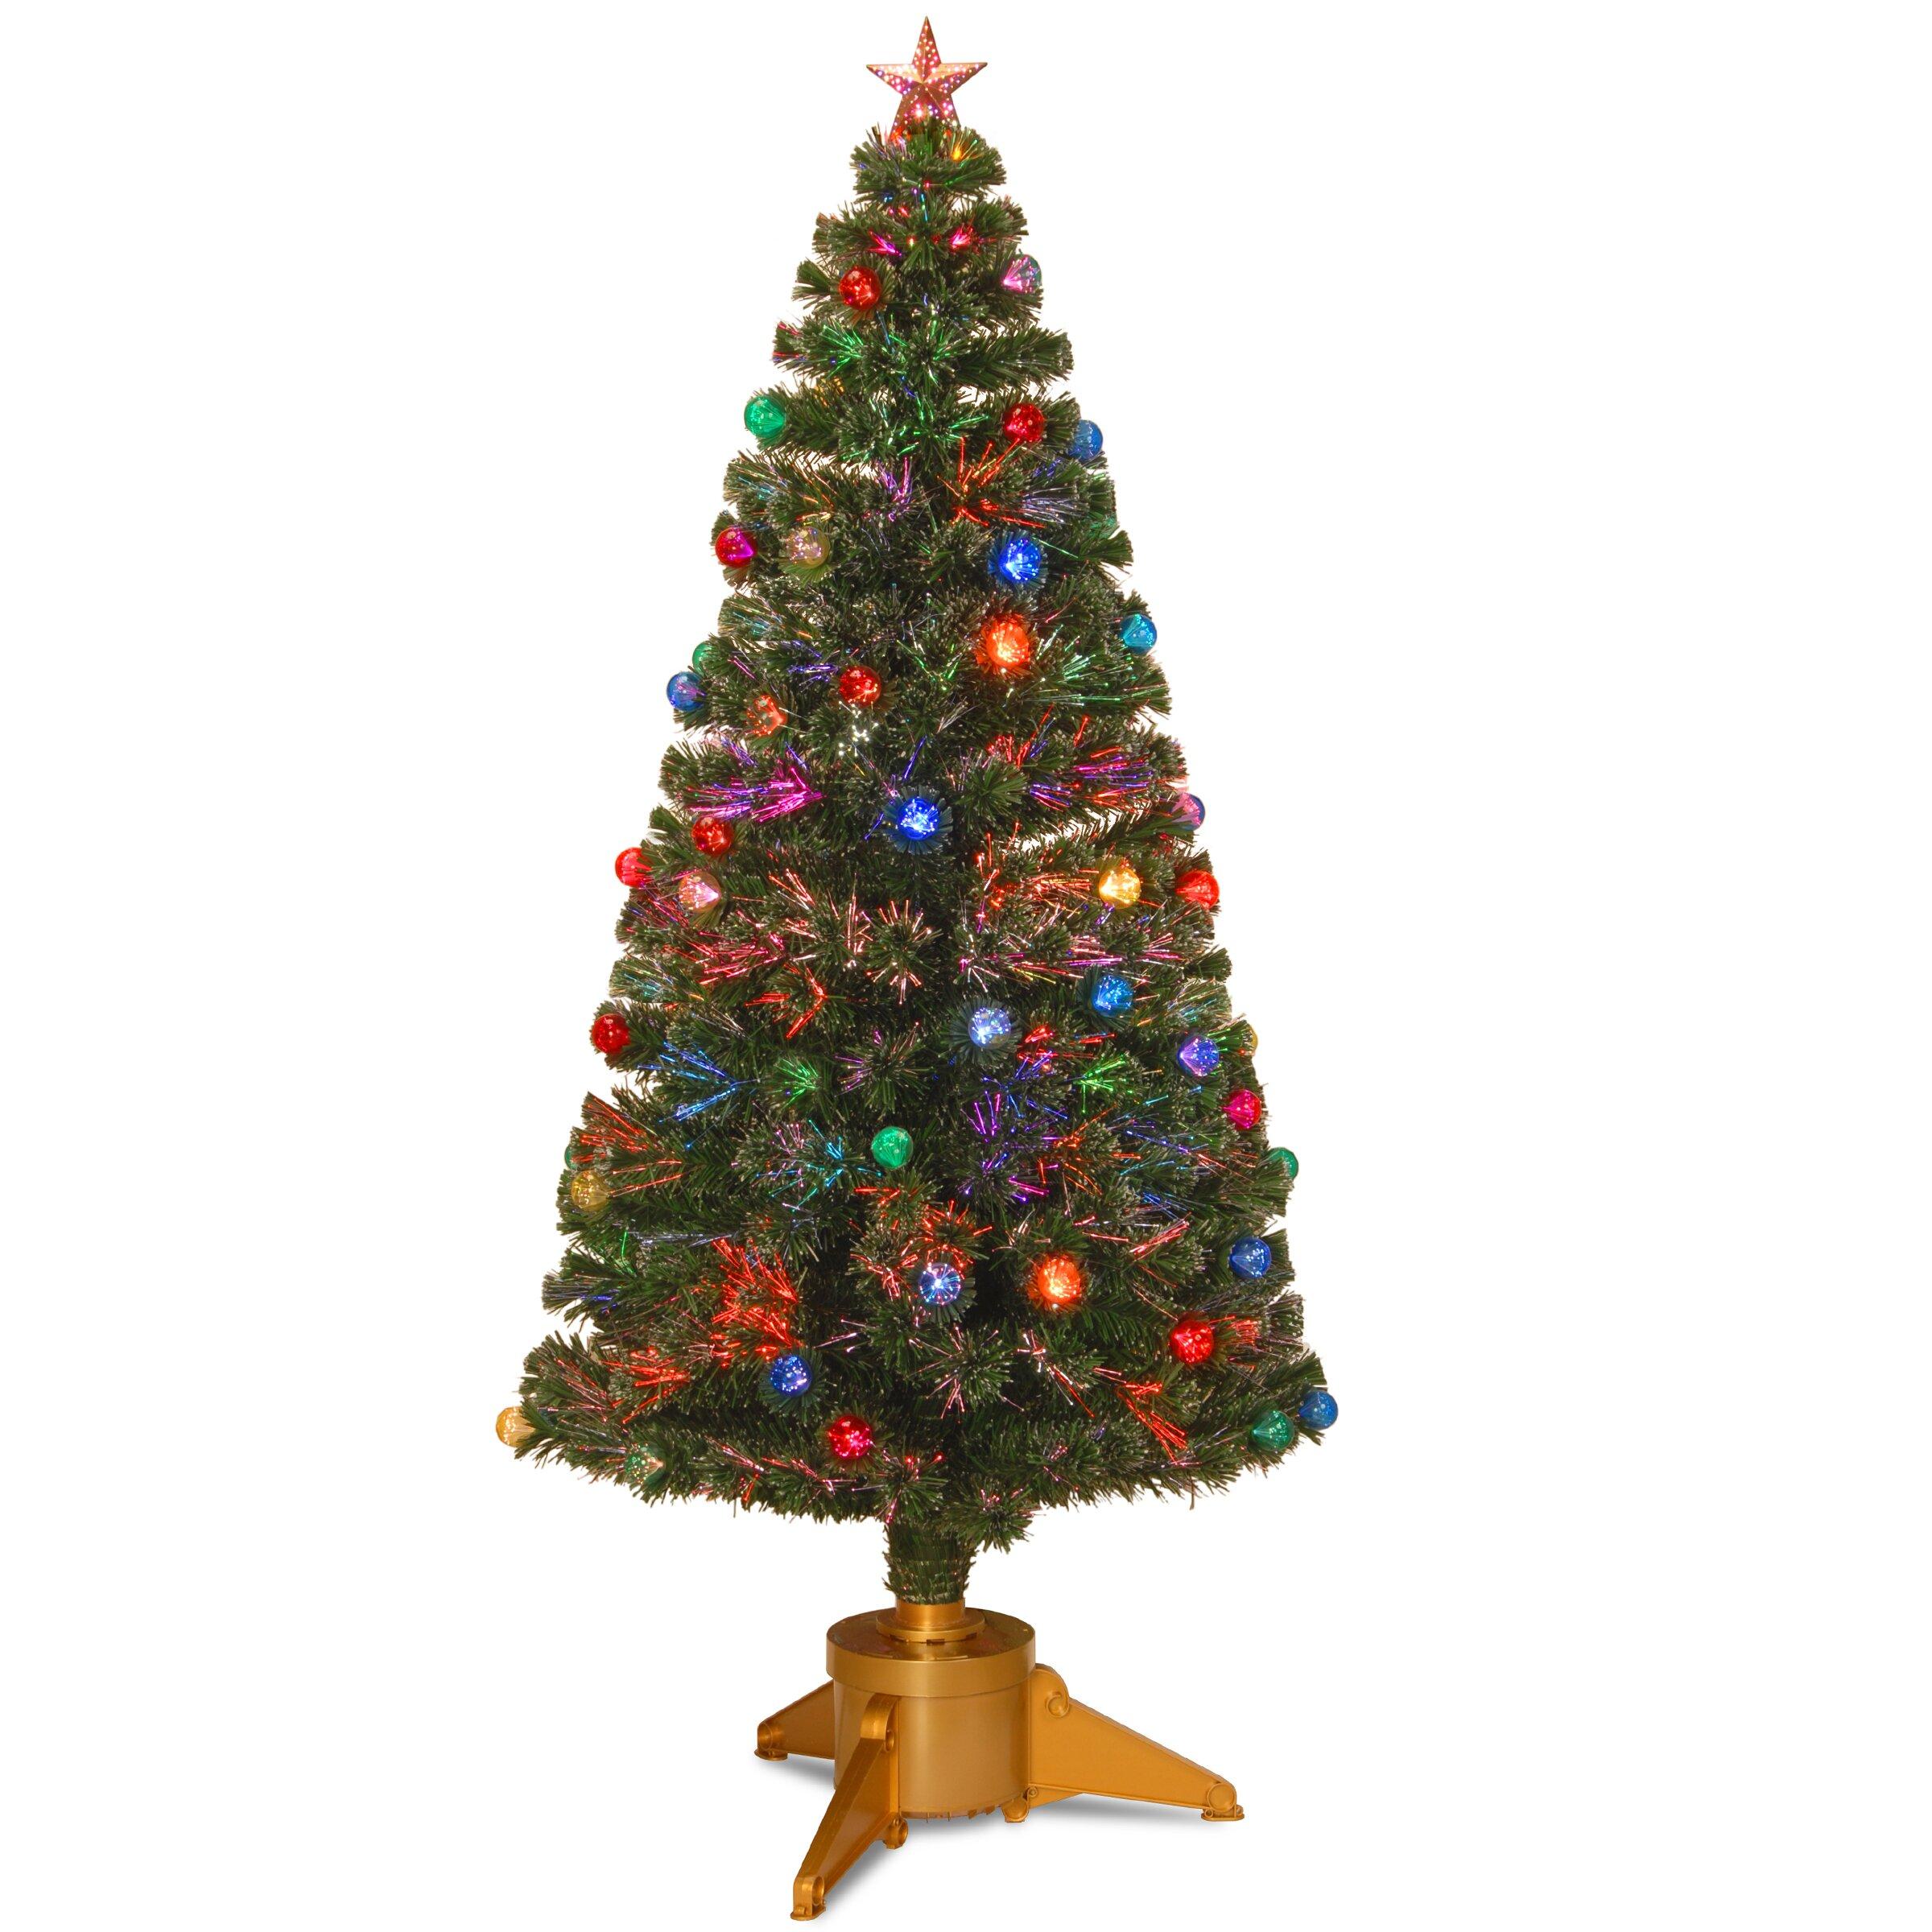 7 5 Fiber Optic Christmas Tree: National Tree Co. Fiber Optics 6' Green Artificial